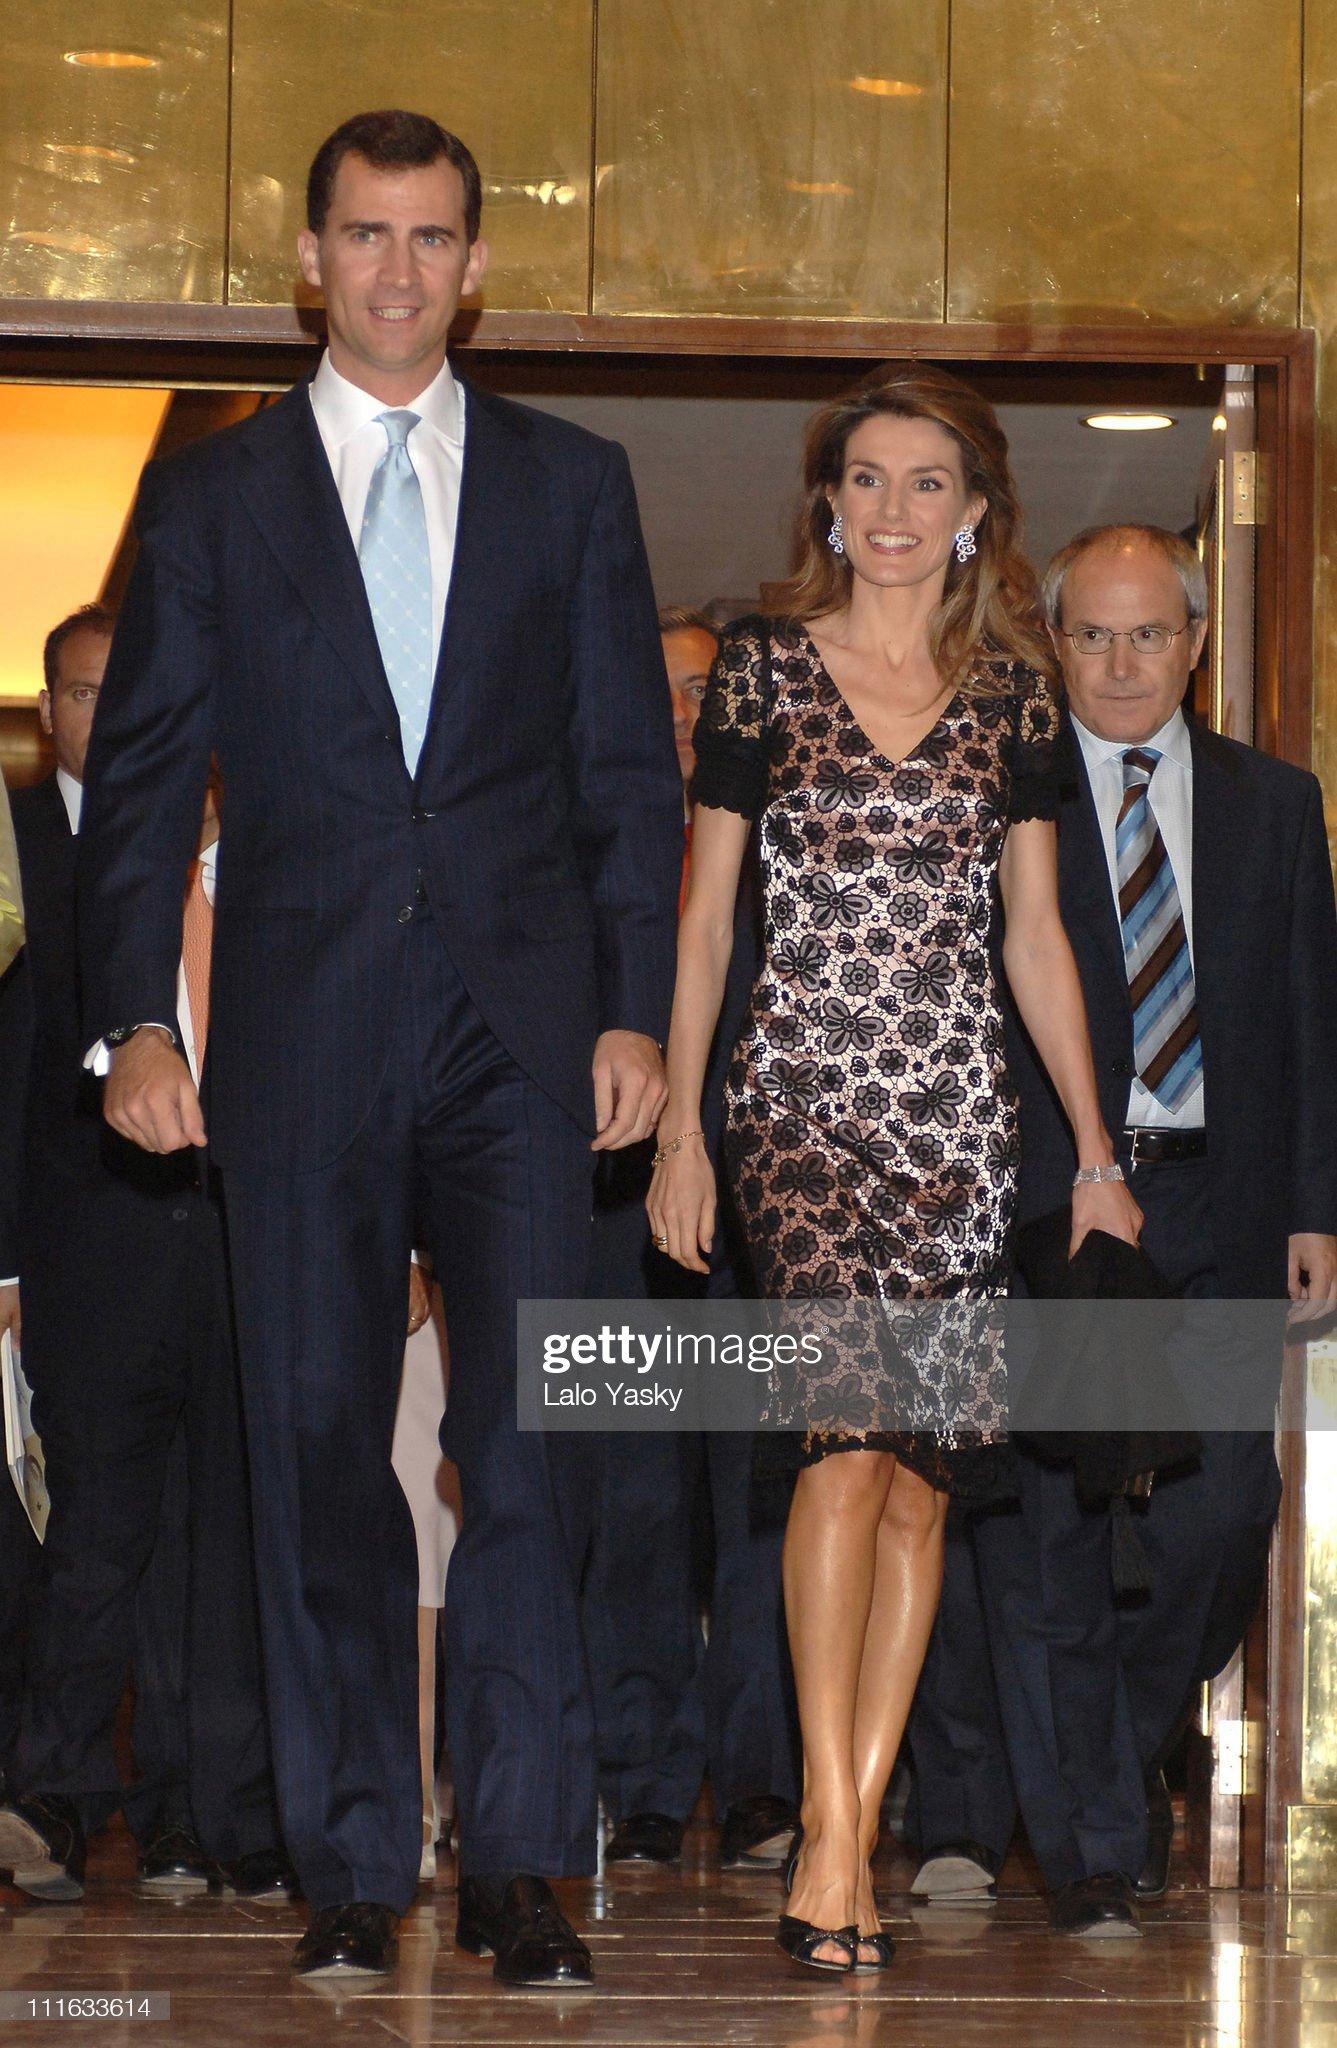 Вечерние наряды Королевы Летиции Prince Felipe and Princess Letizia Preside Annual COTEC Foundation Dinner - June 15, 2006 : News Photo